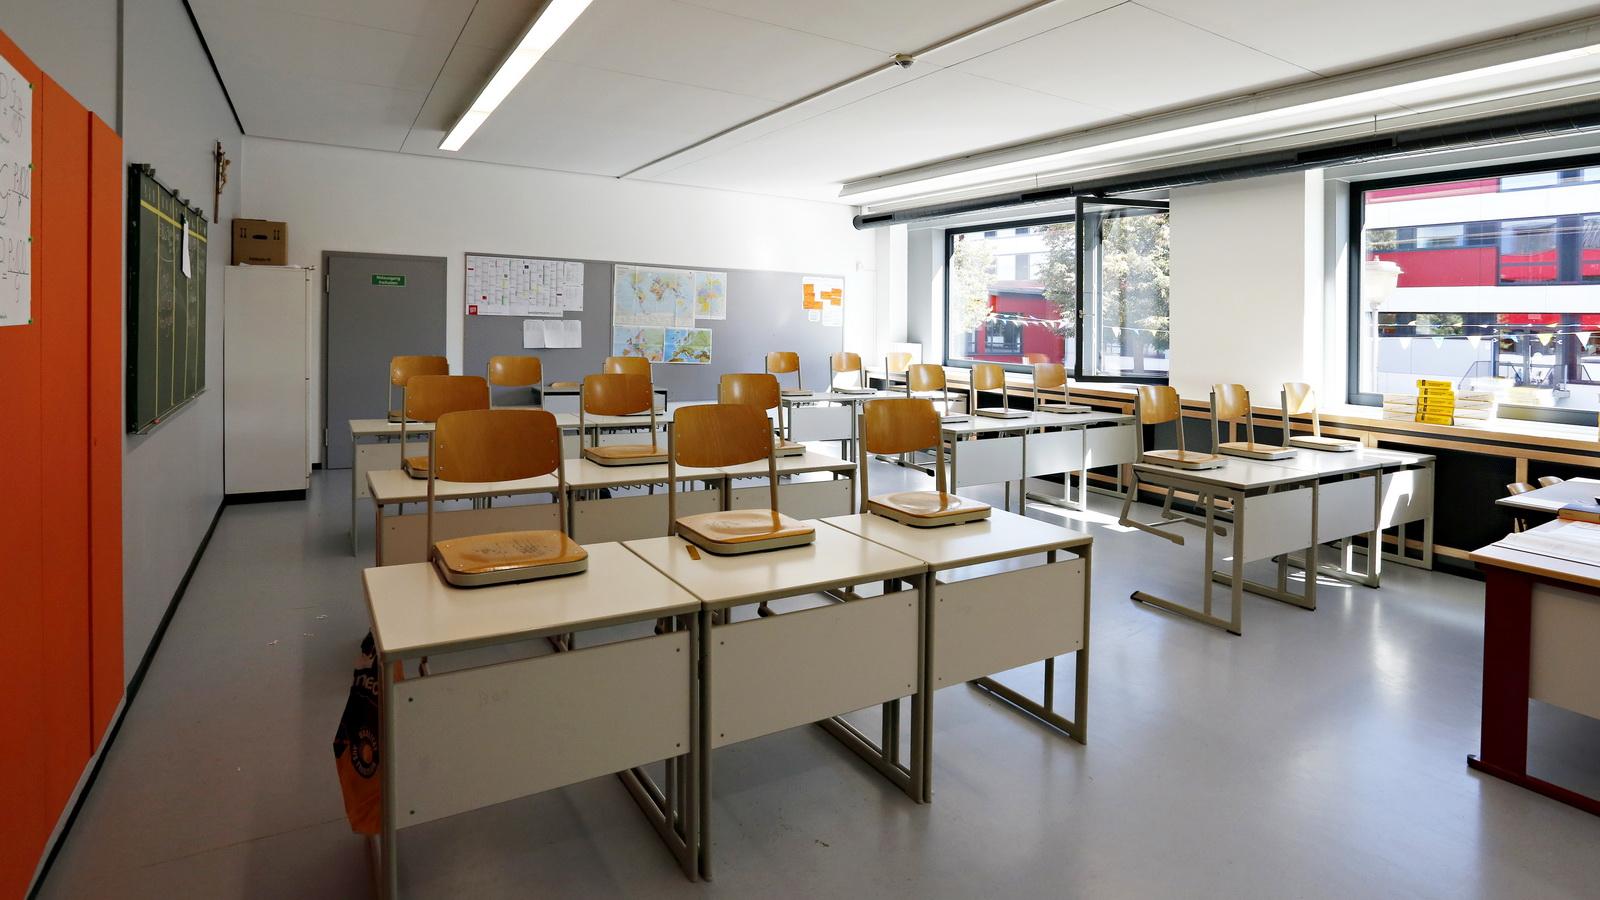 Blick ins Klassenzimmer der Schule Nord in FFB